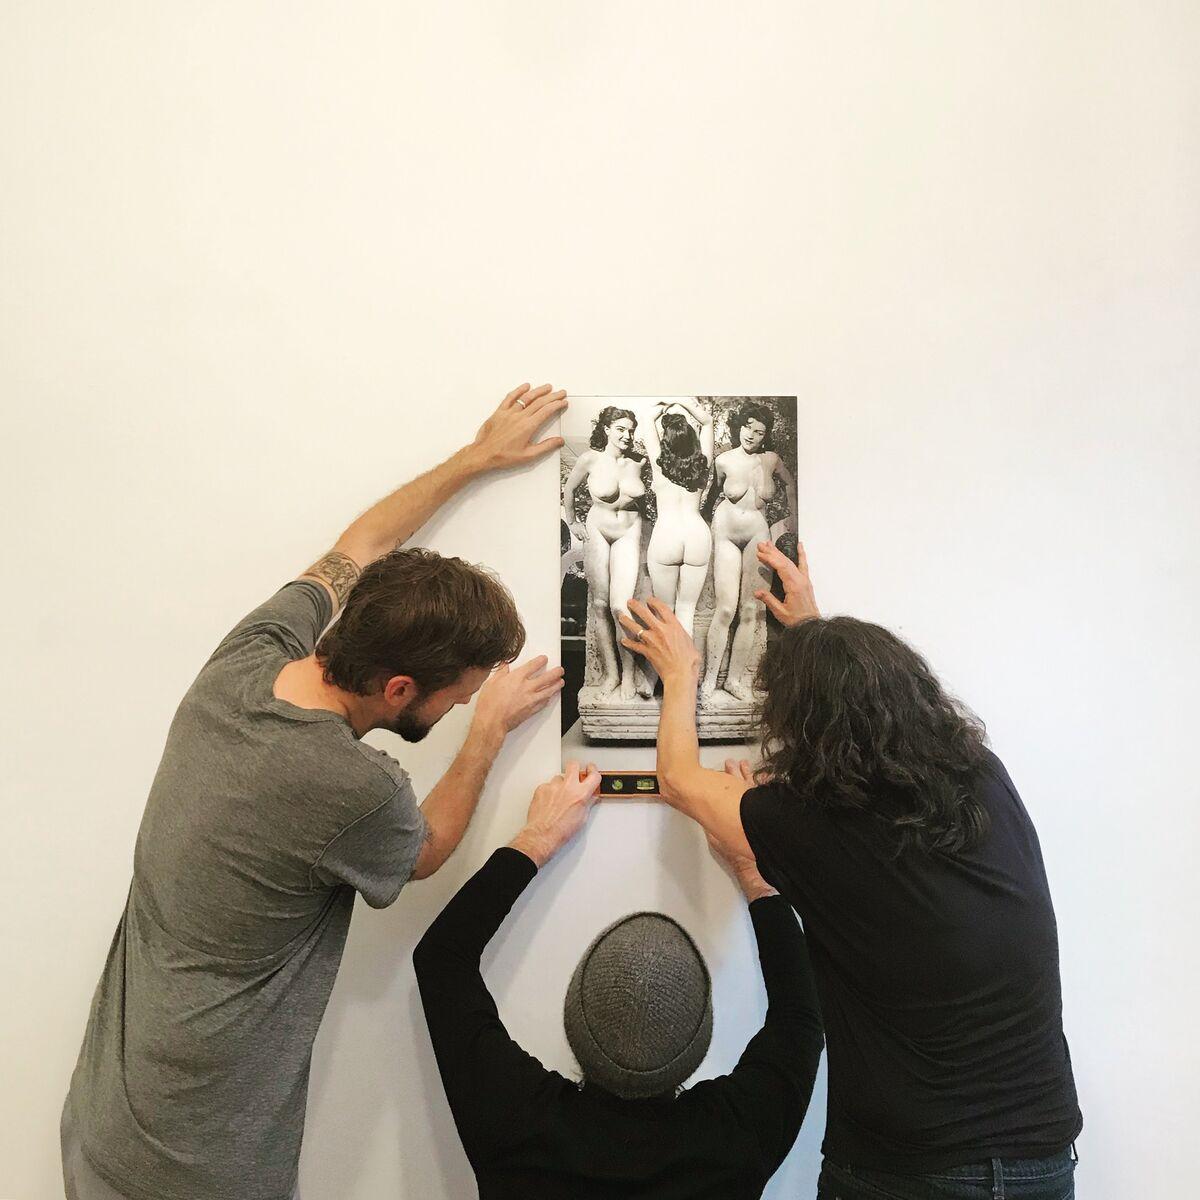 Scott Indrisek, John Miller, and Aura Rosenberg install a lenticular work by Rosenberg at Teen Party. Courtesy of Teen Party.